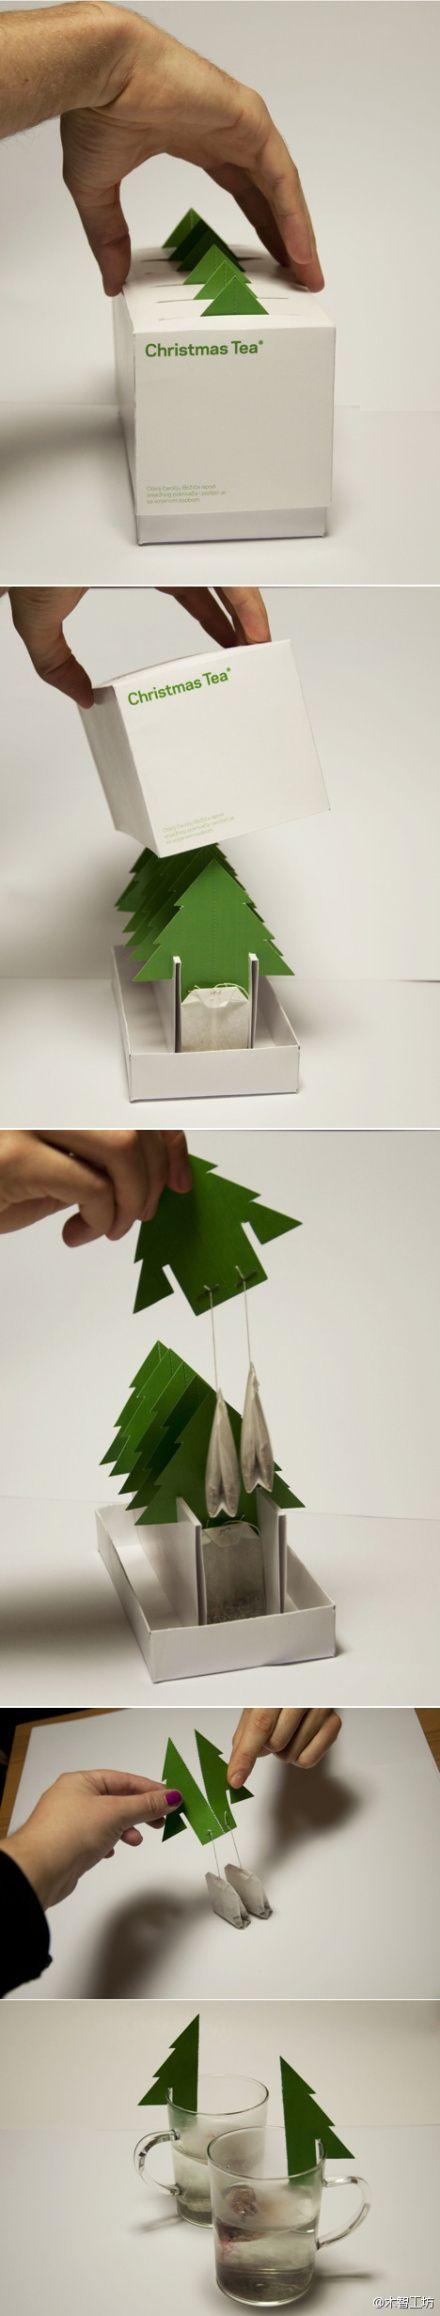 Christmas tea - isn't it something!